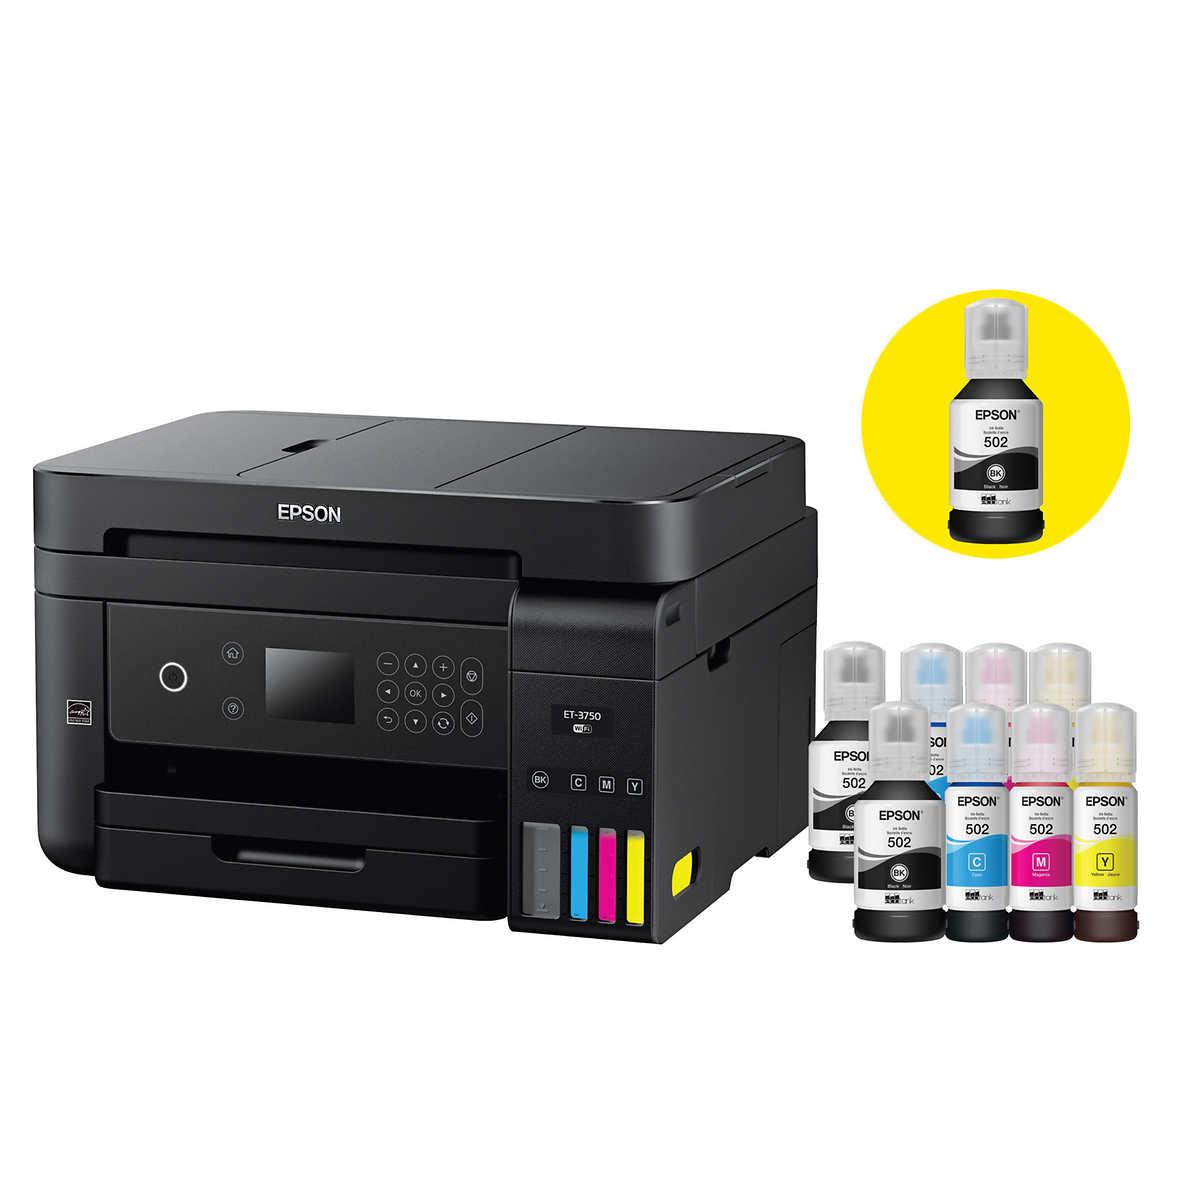 Epson WorkForce EcoTank 3750 Special Edition All-in-One Printer With Bonus  Black Ink